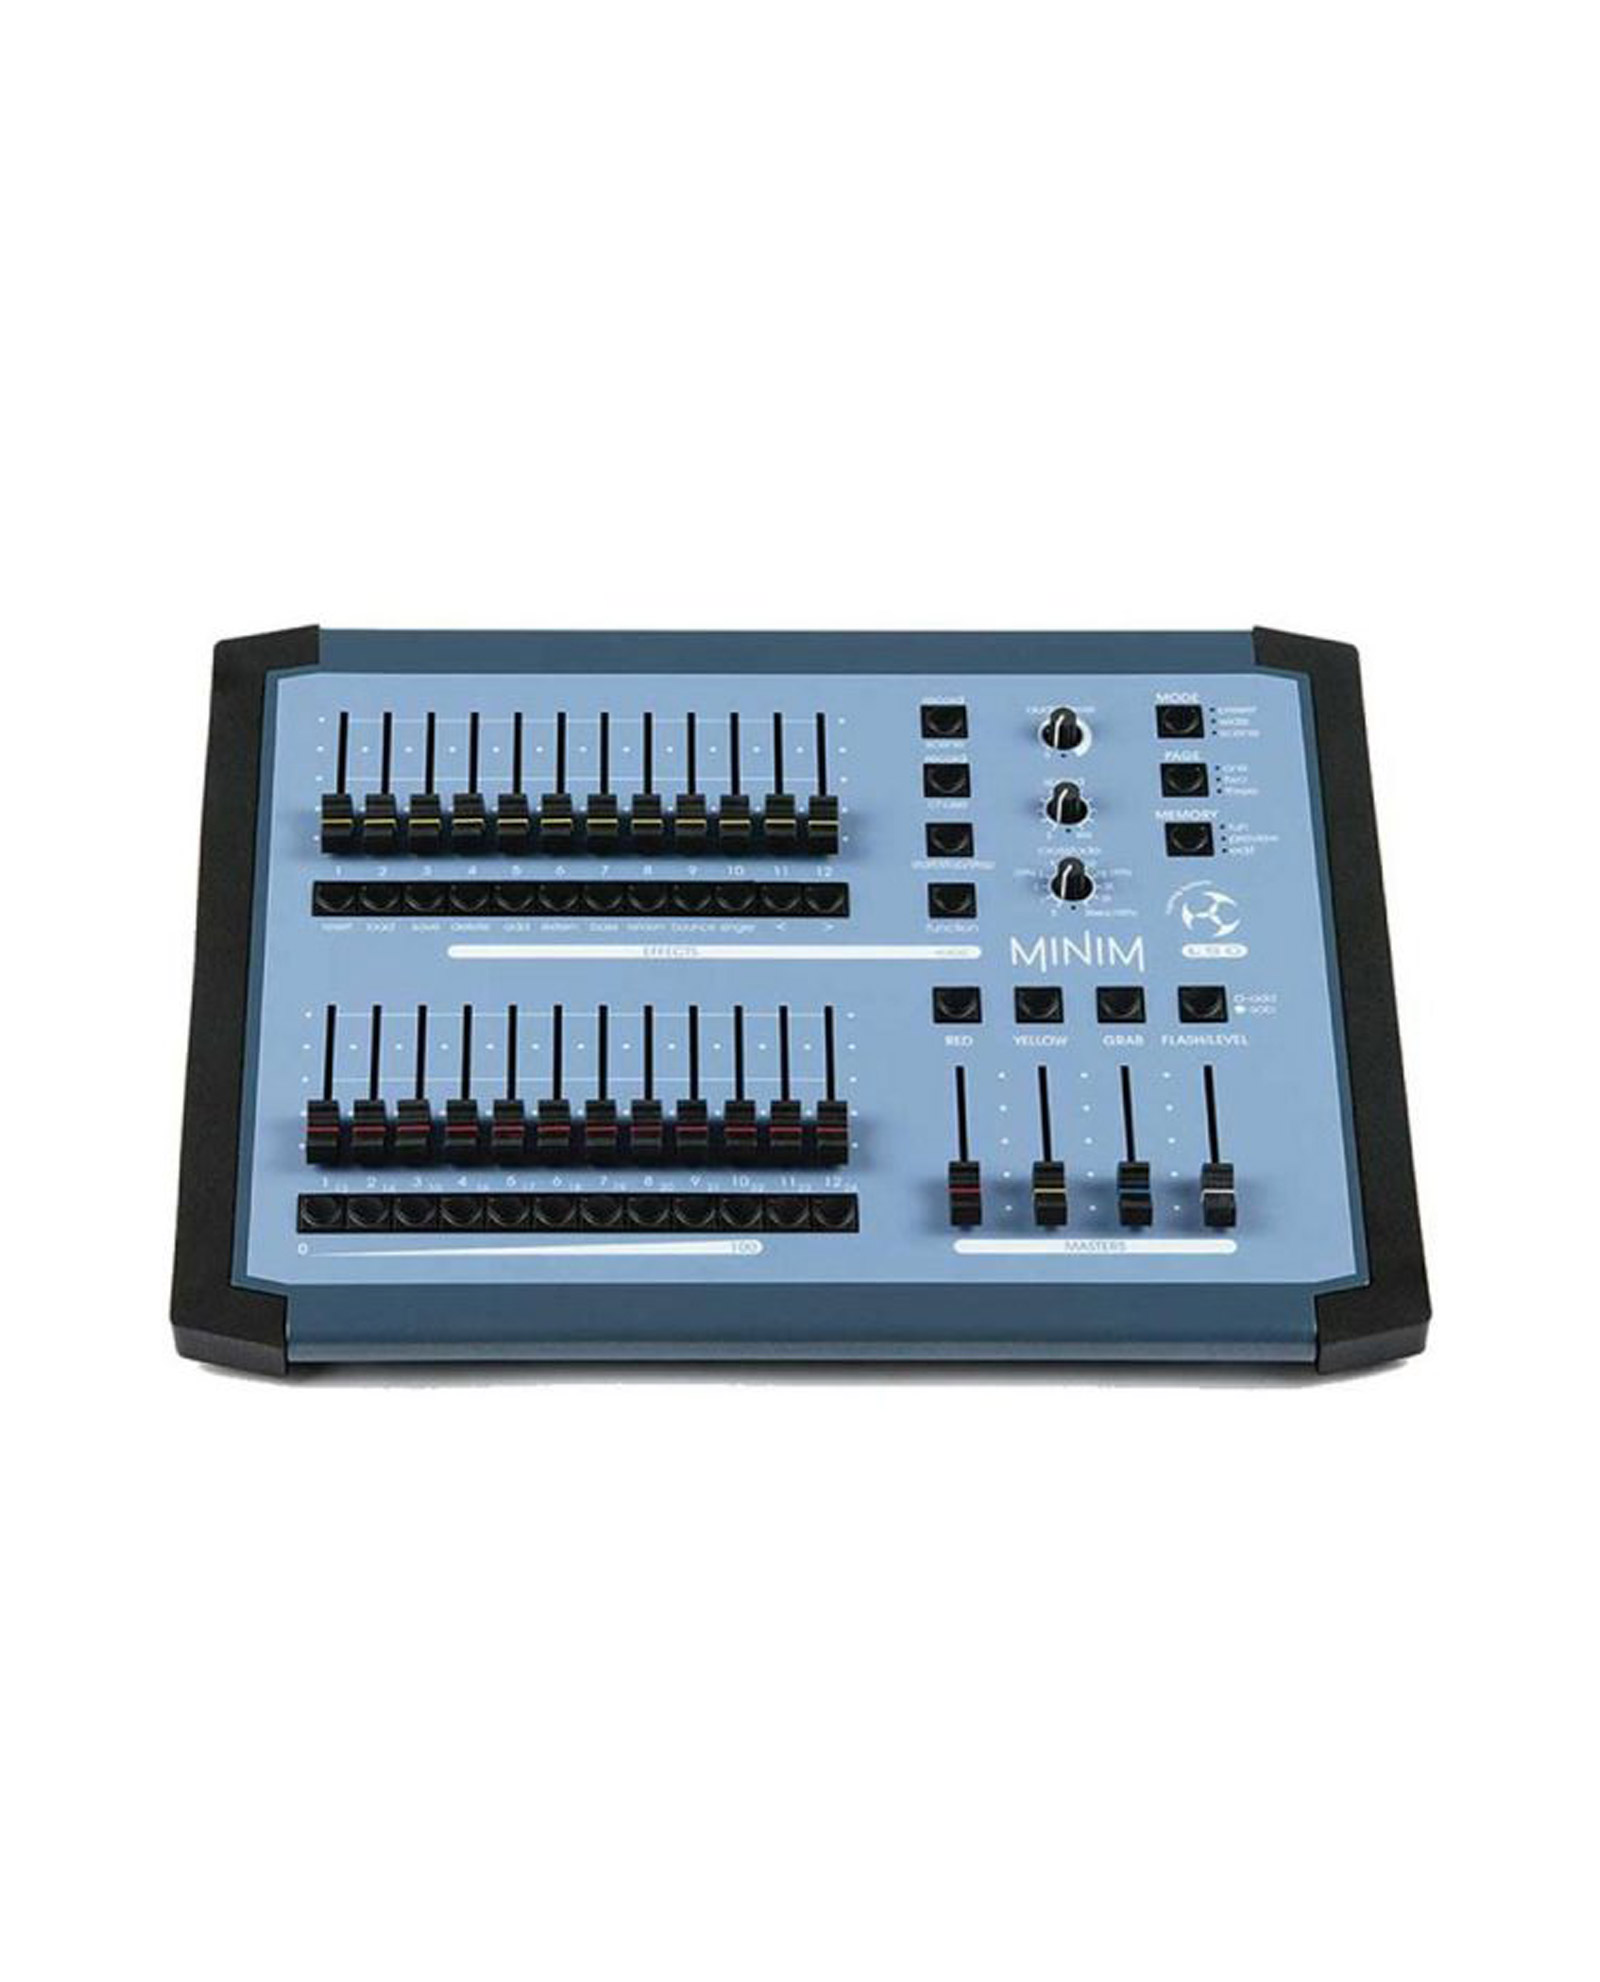 Lsc Minim 24 Faders 512 Dmx Channel Console